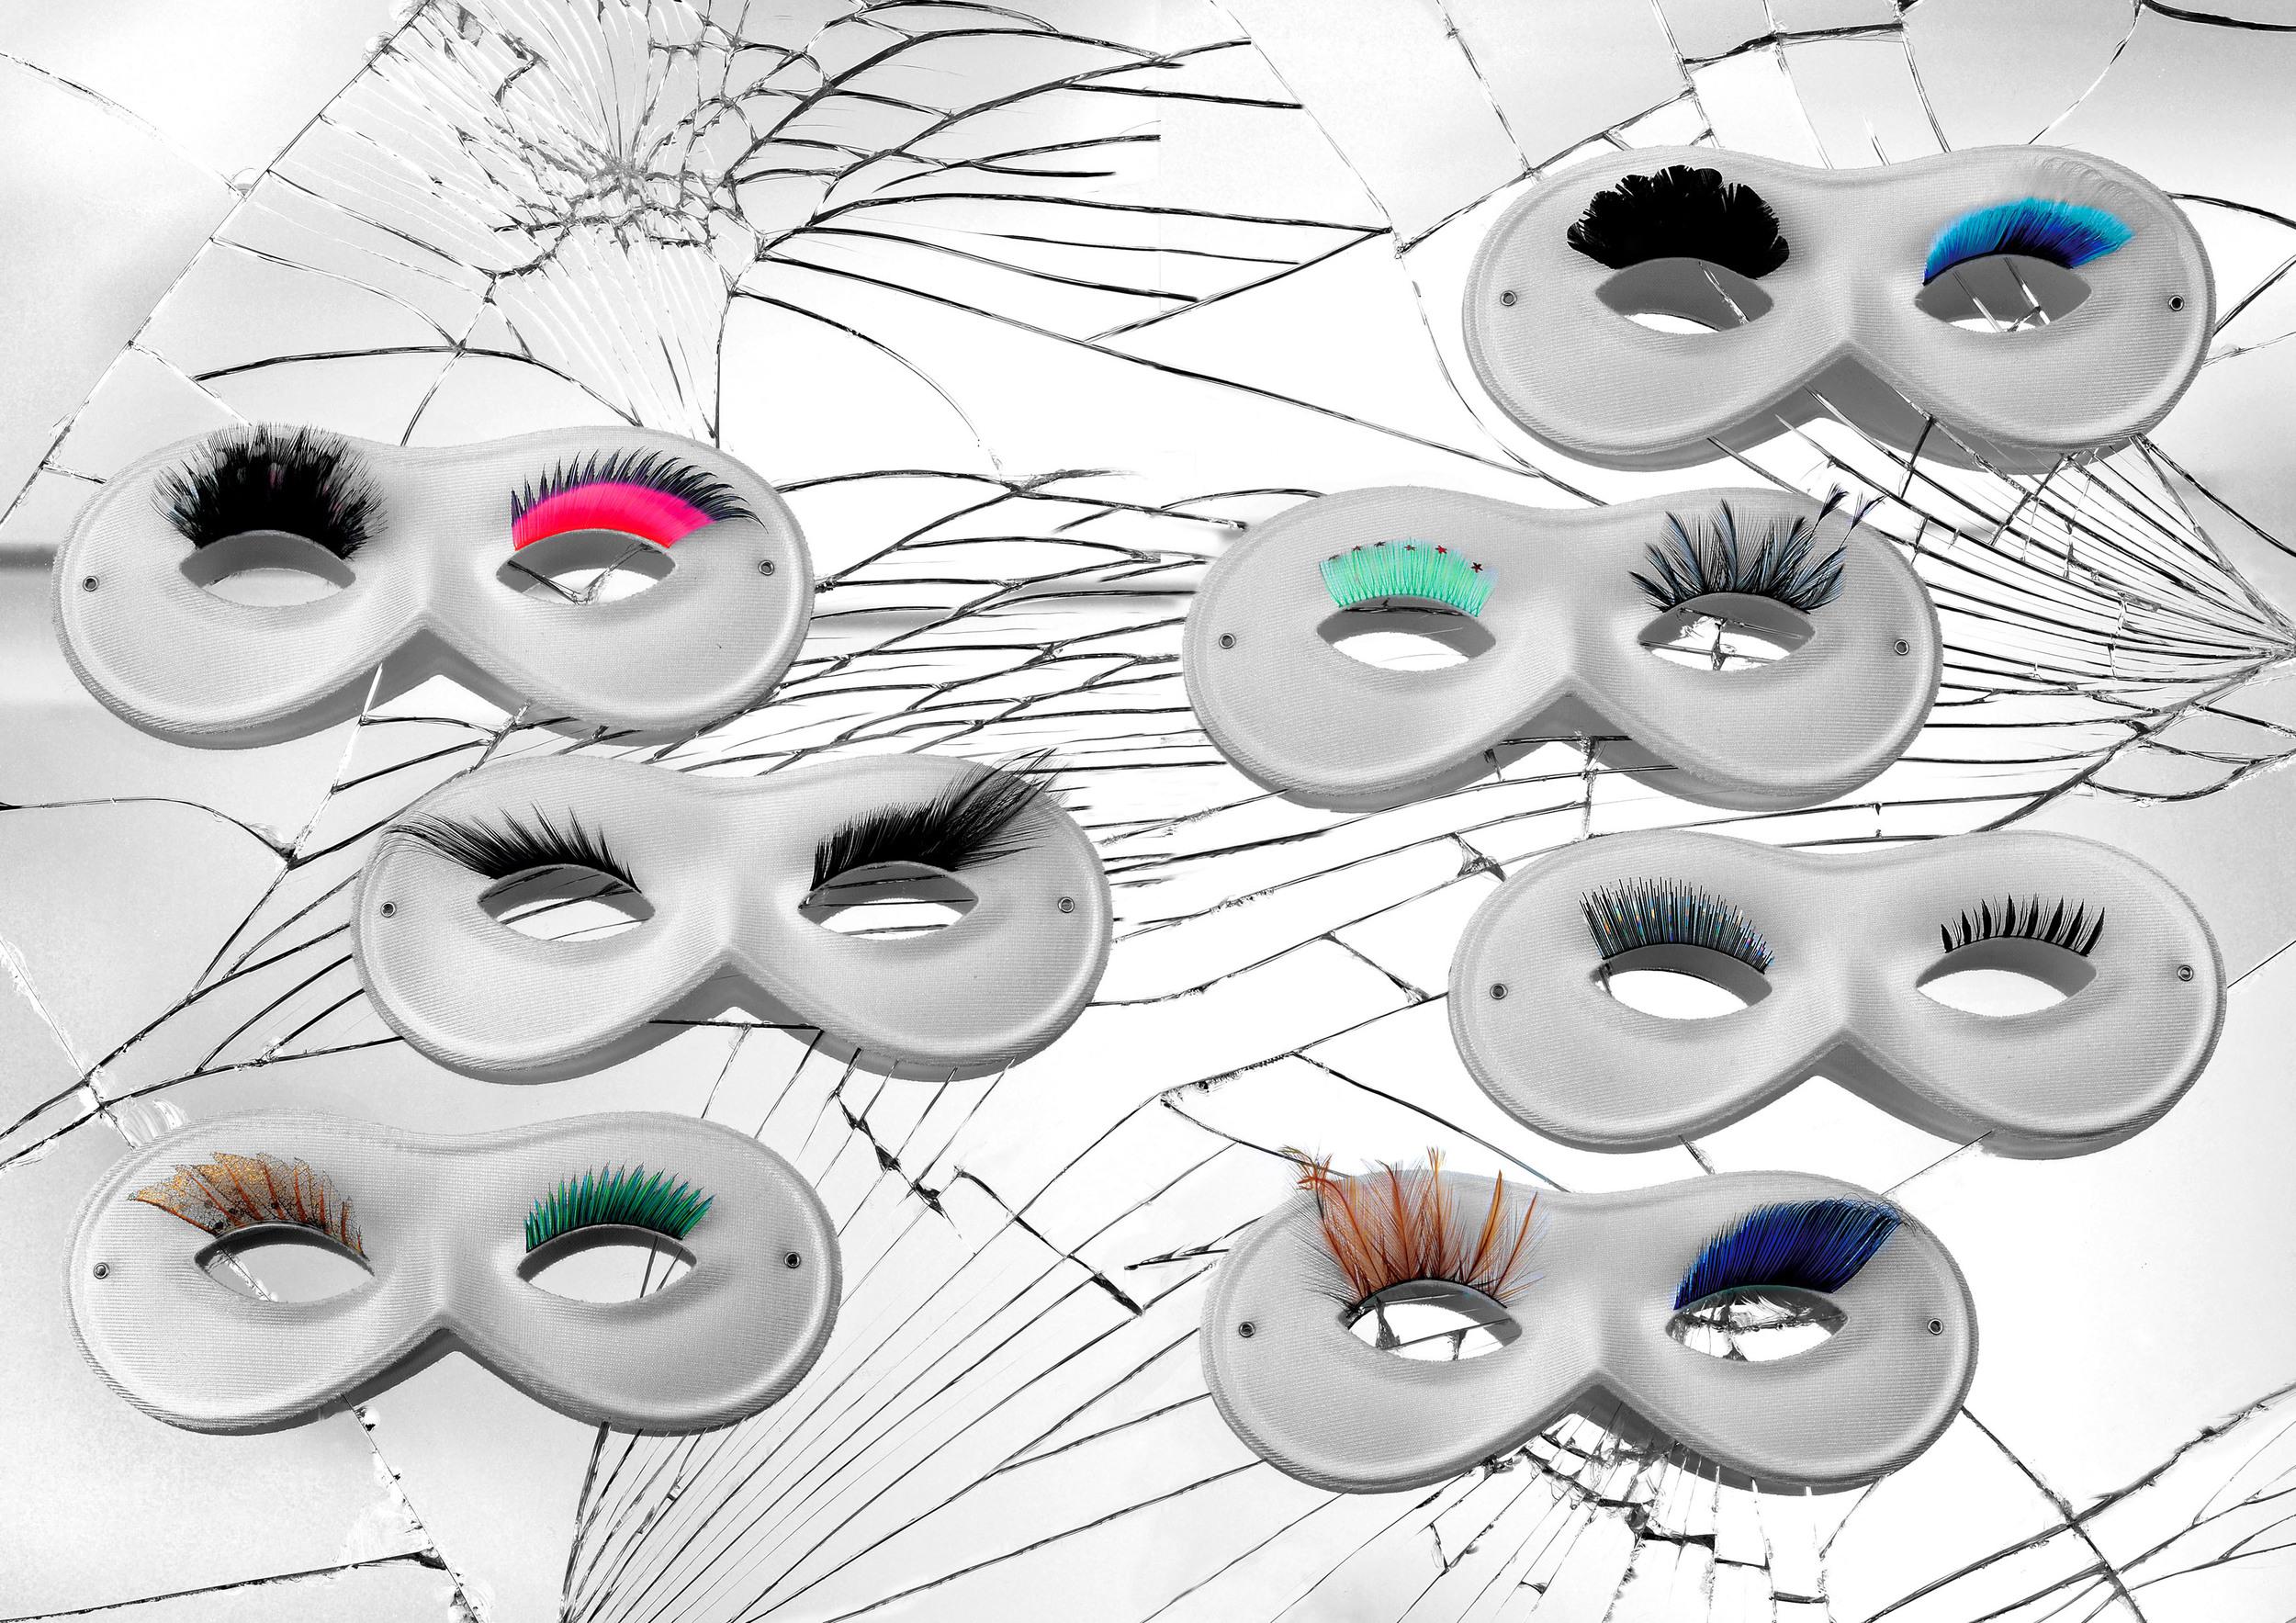 Masks on glass a.jpg